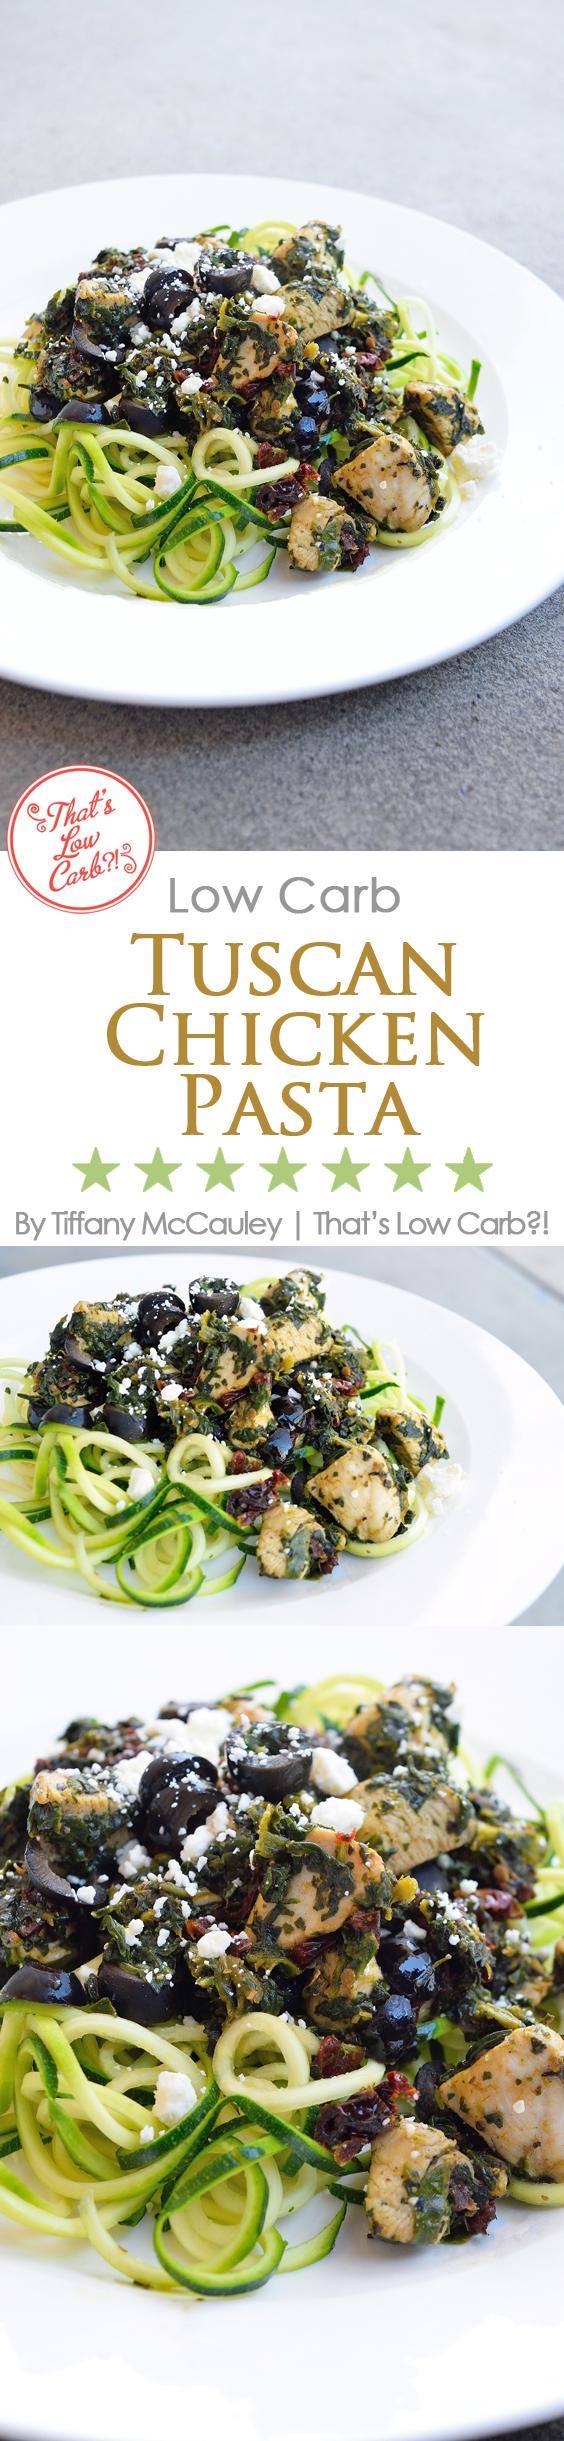 Low Carb Tuscan Chicken Pasta Recipe